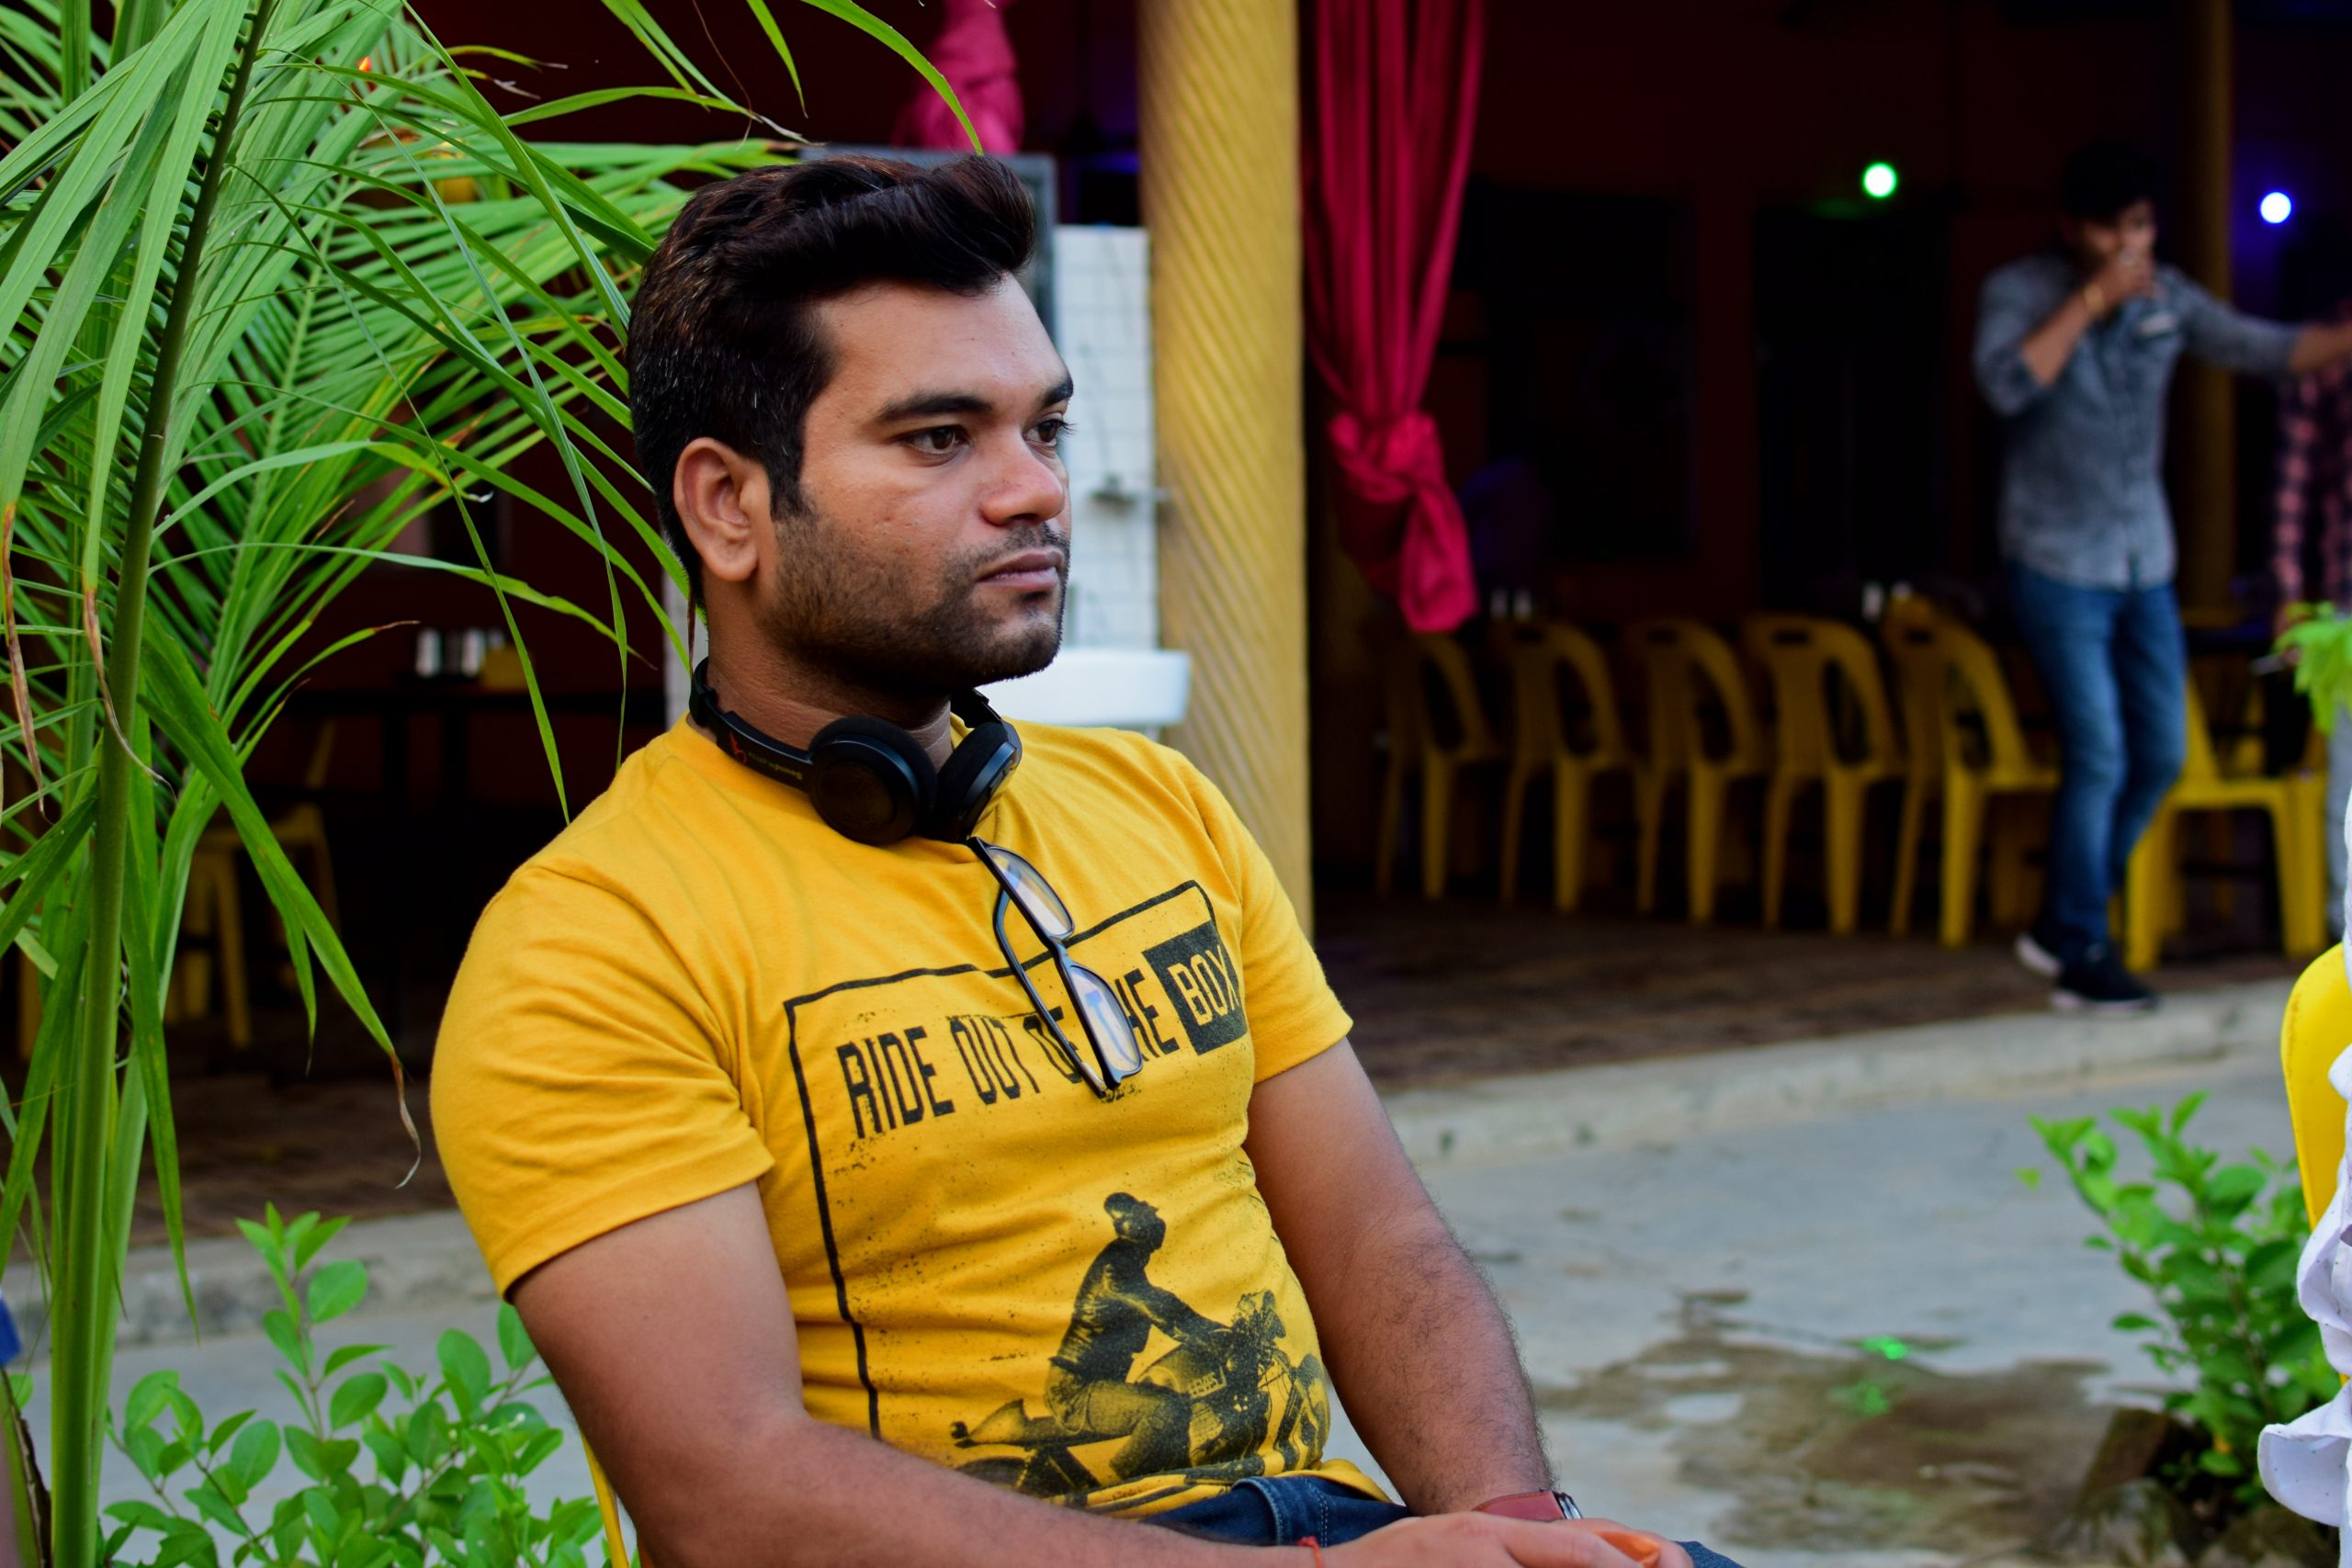 Man sitting with headphone